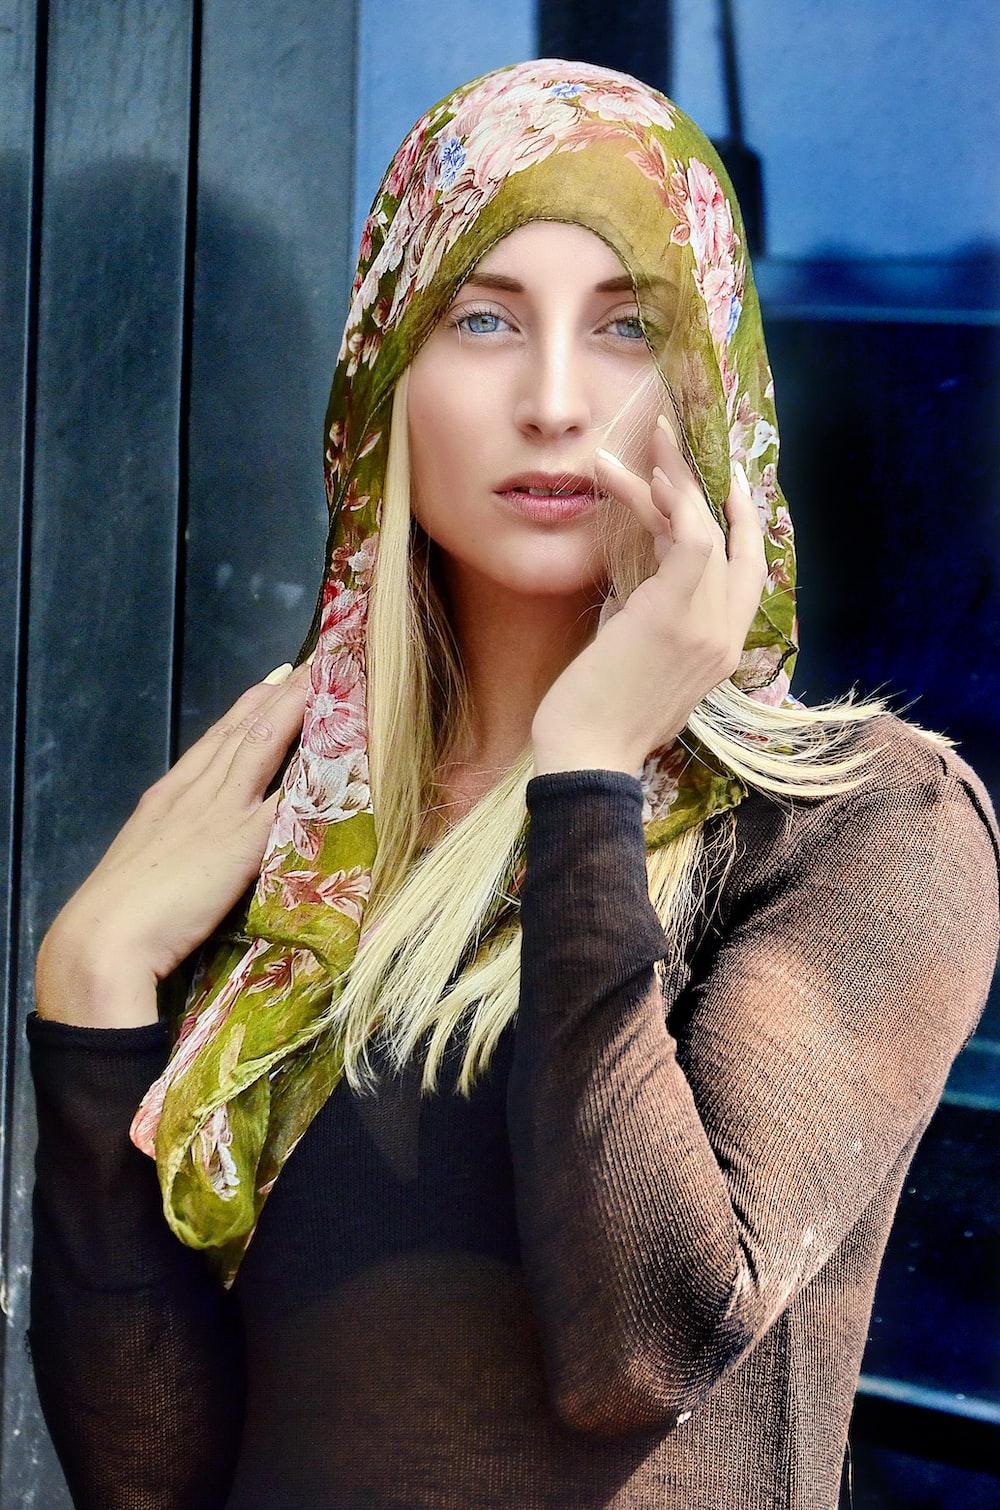 woman wearing headdress touching her cheek